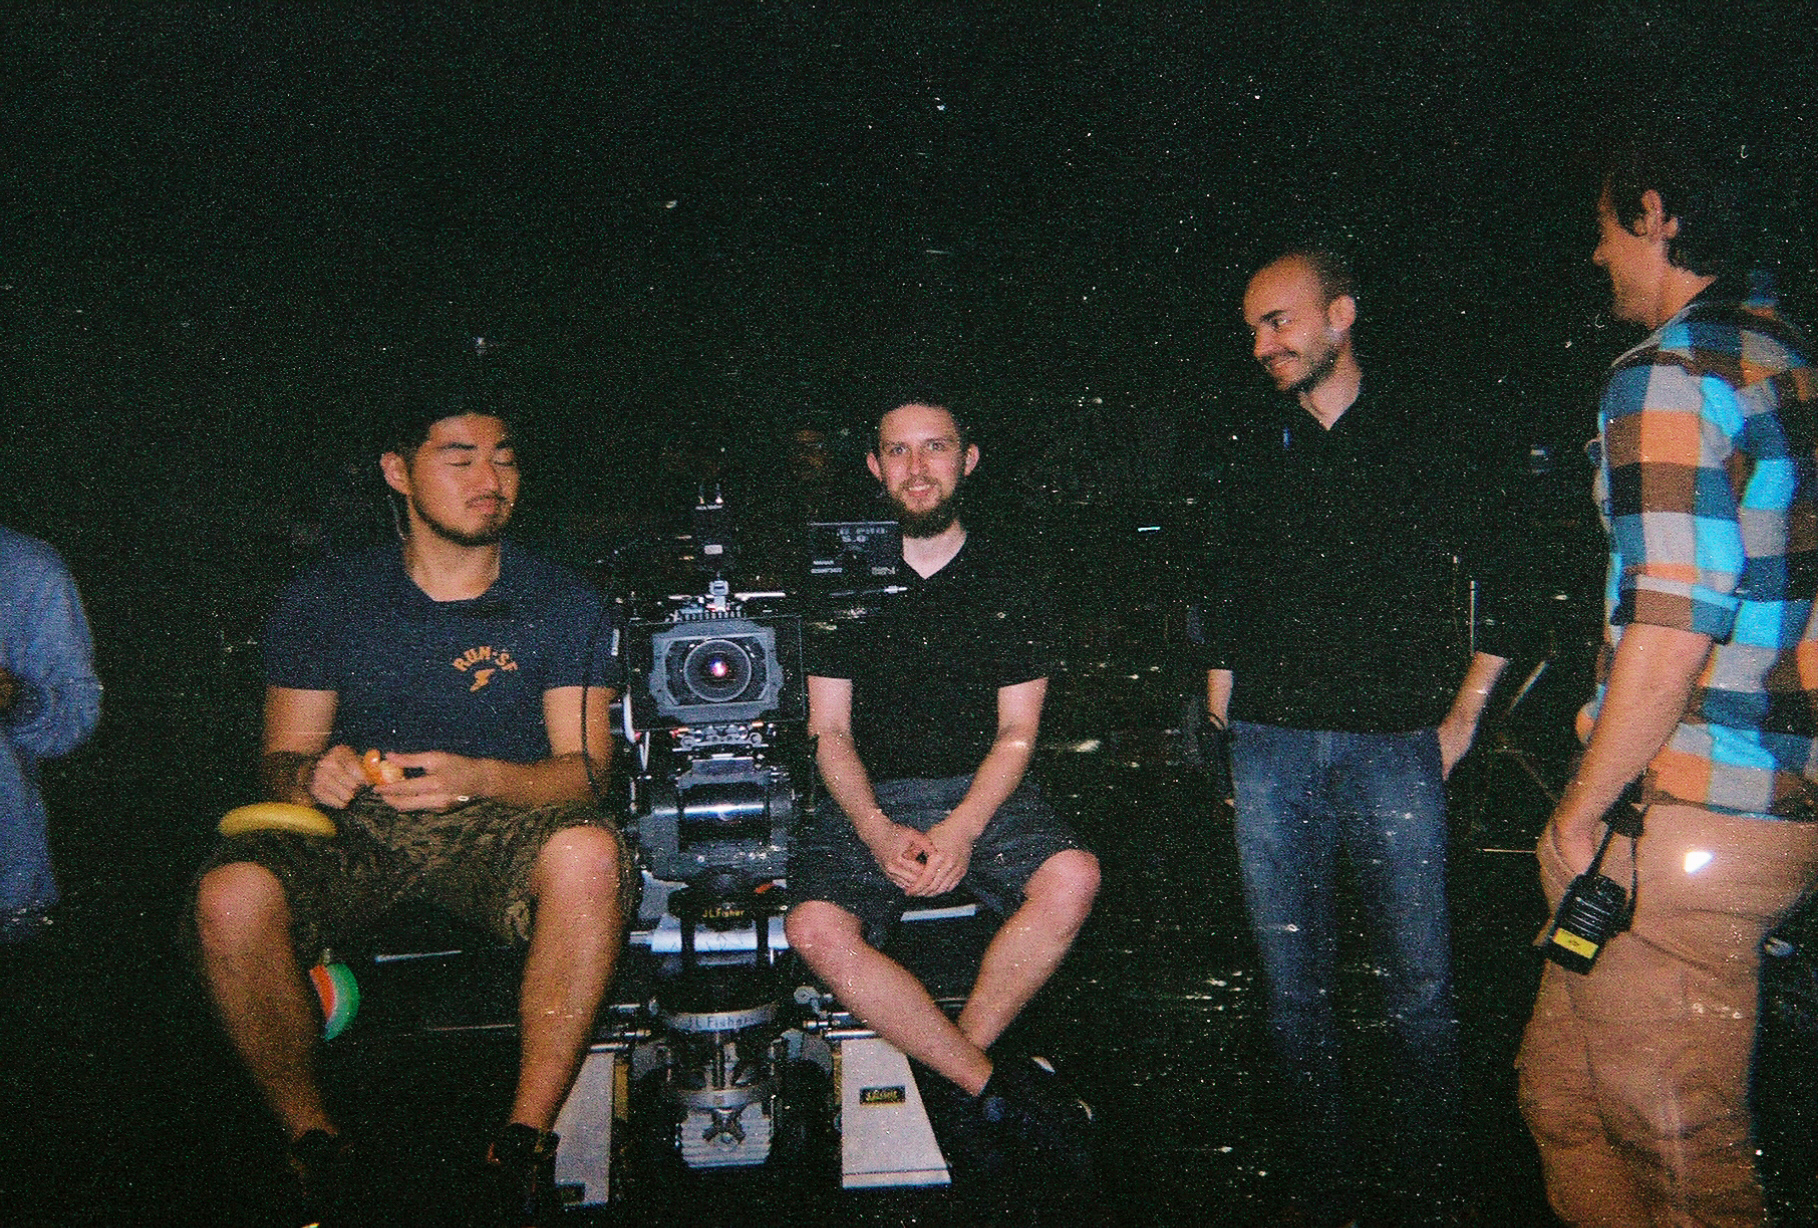 (left to right) 1st AC John, 2nd AC Joe Seiler, Producer Scott, 1st AD Patrick